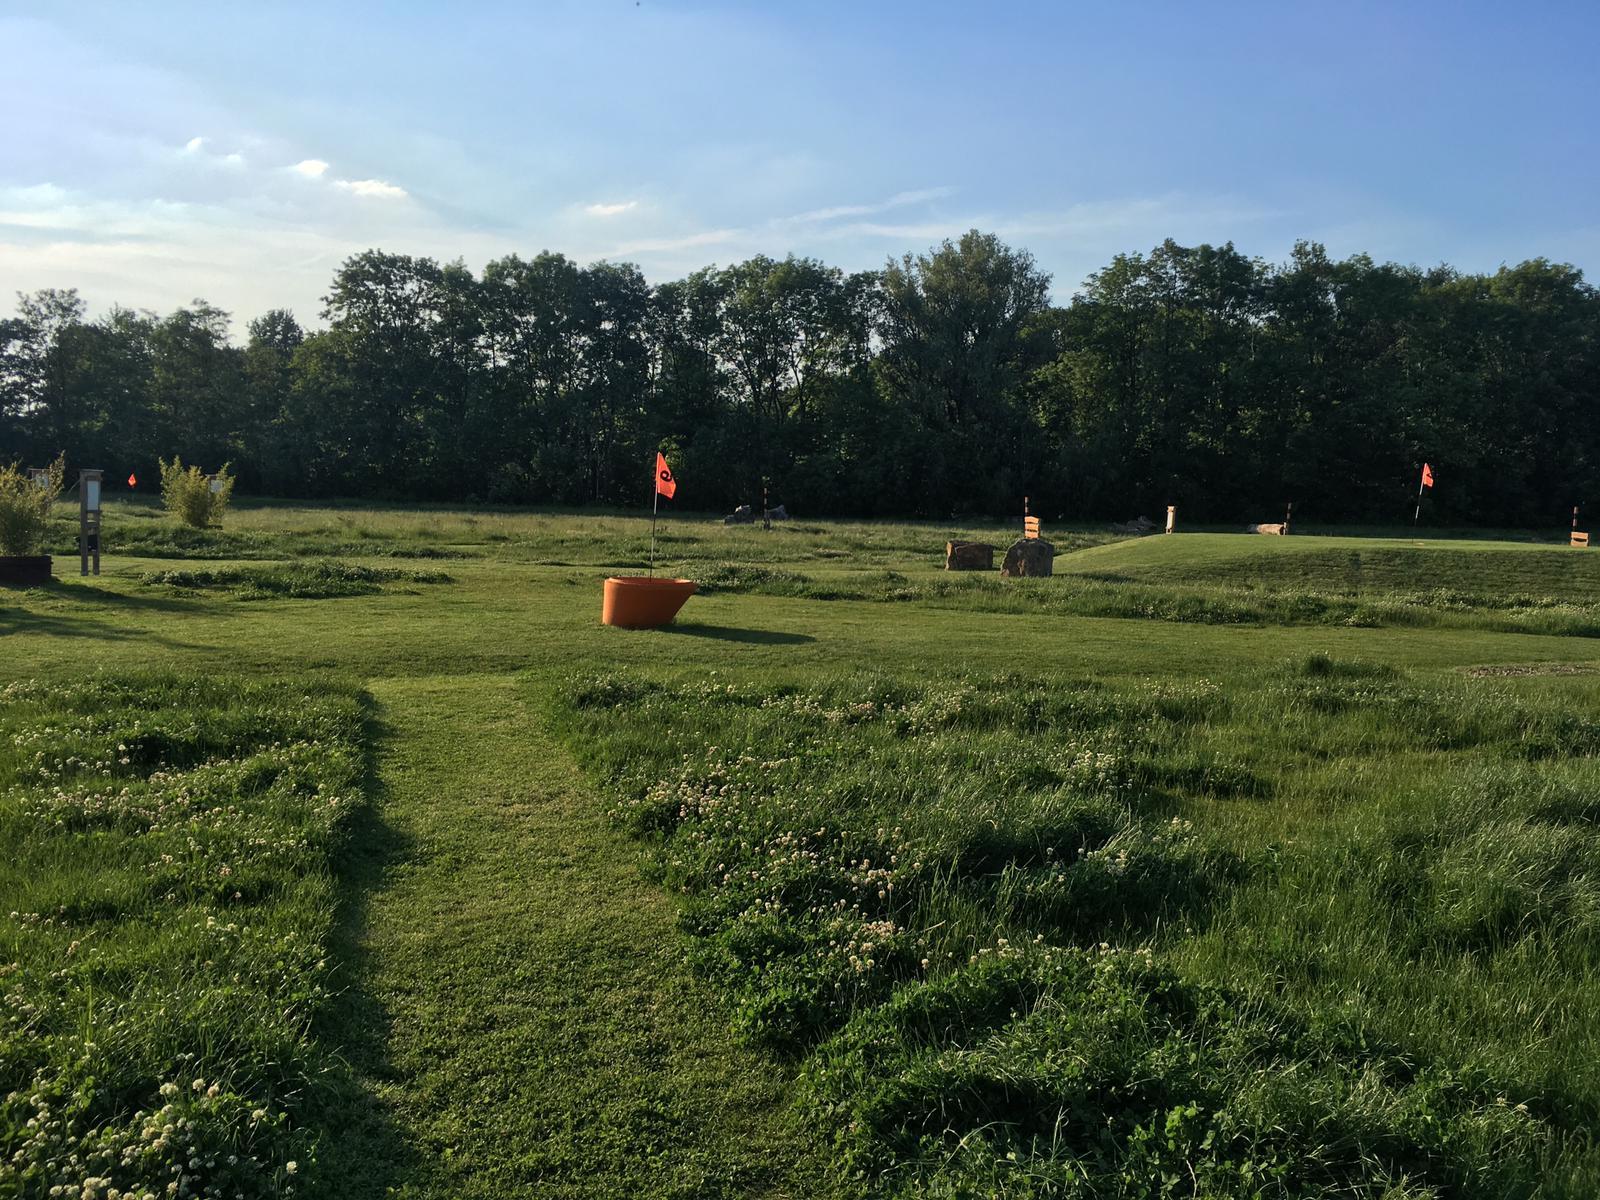 Soccerpark Westfalen Soccerpark Westfalen De